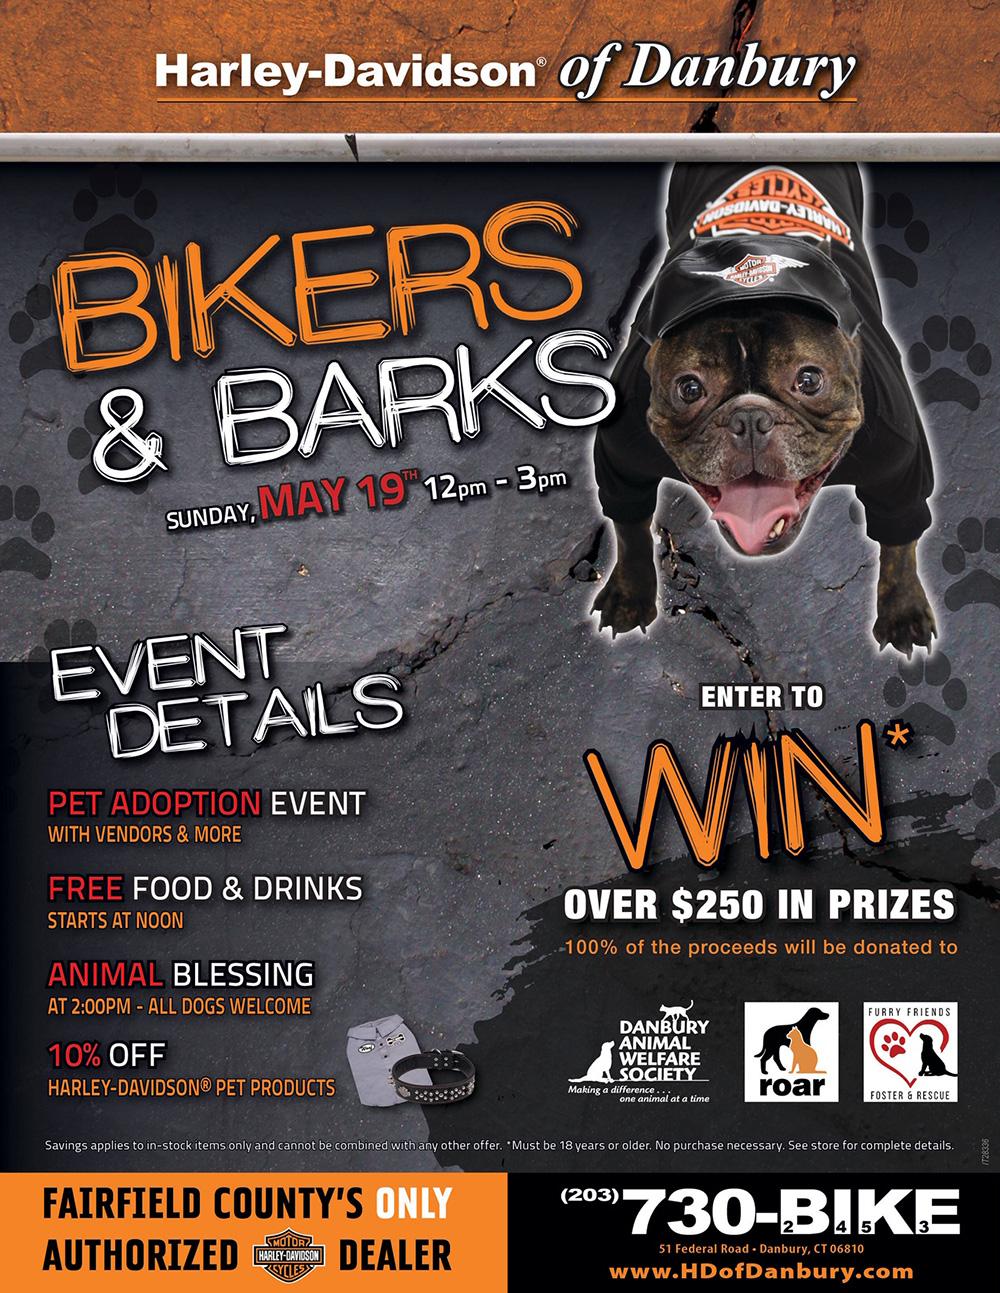 Bikes And Barks Harley Davidson Adoption Event Danbury Animal Welfare Society